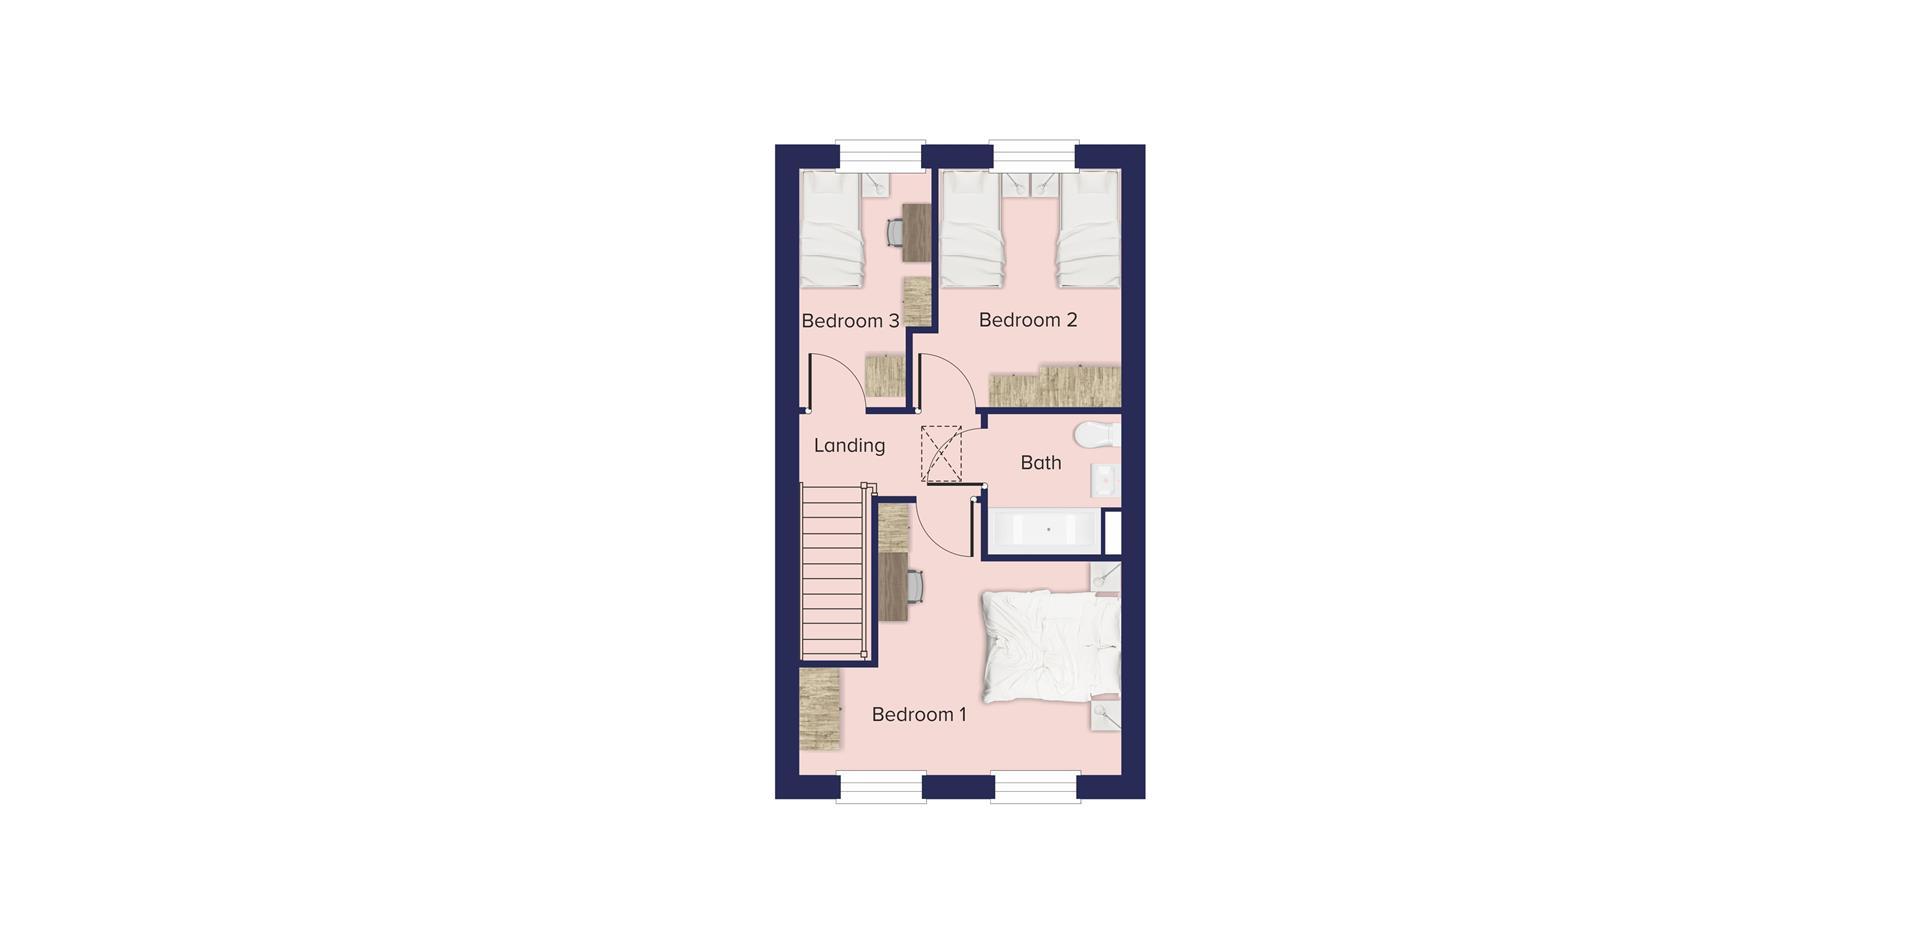 The Woodlands, Church Crookham_Plots 806, 807, 808